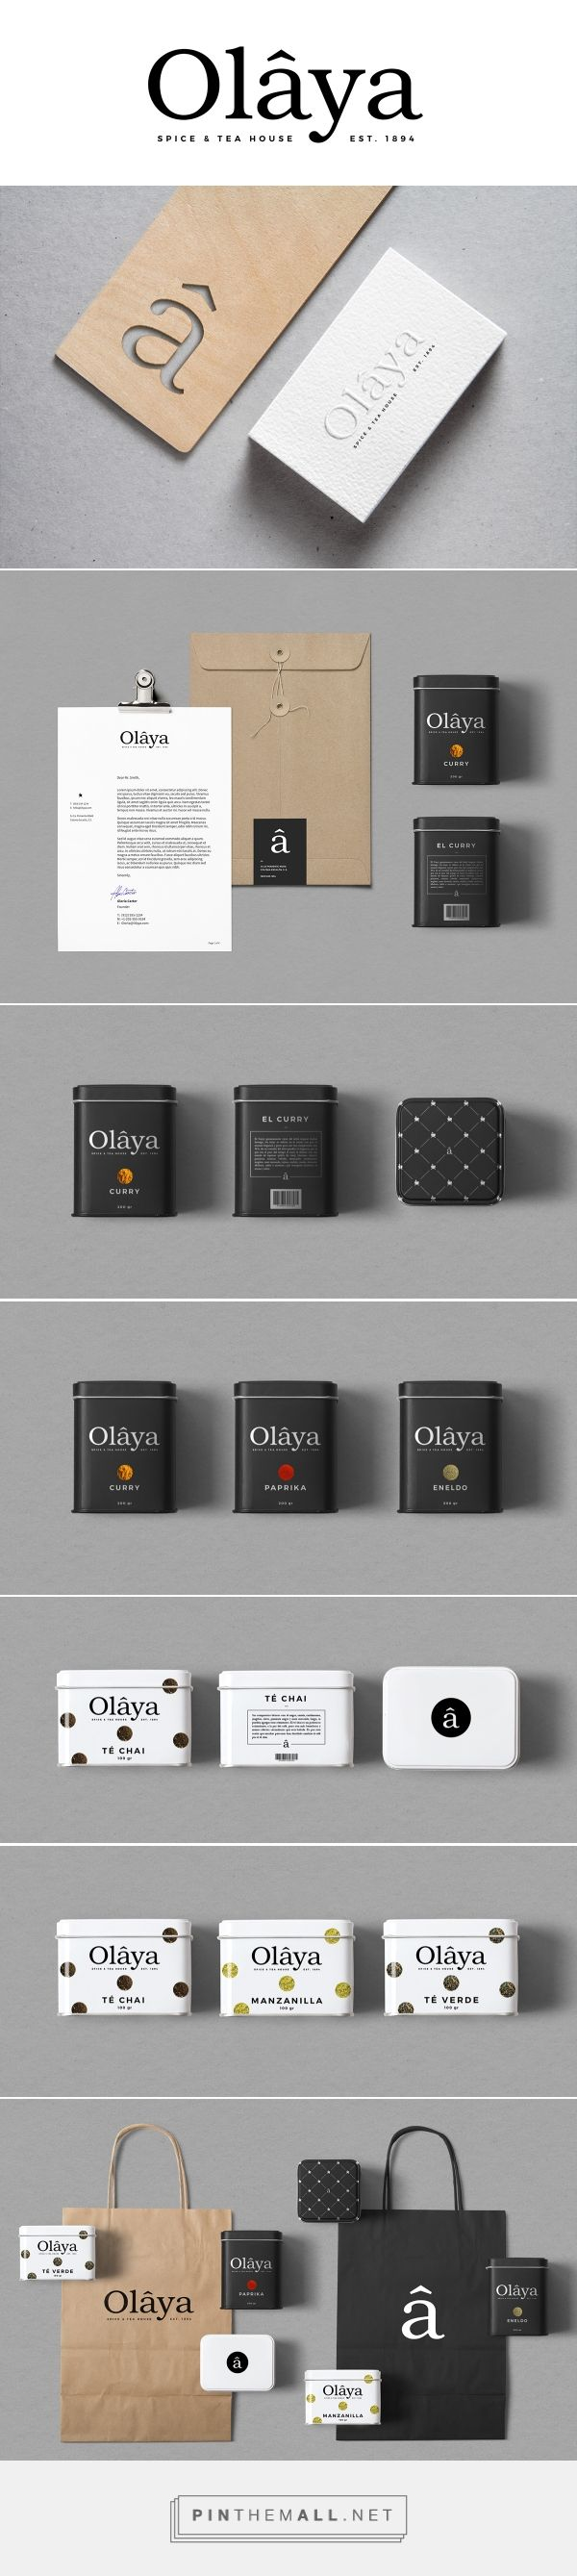 Olâya Branding and Packaging by Elemasele on Behance | Fivestar Branding –…